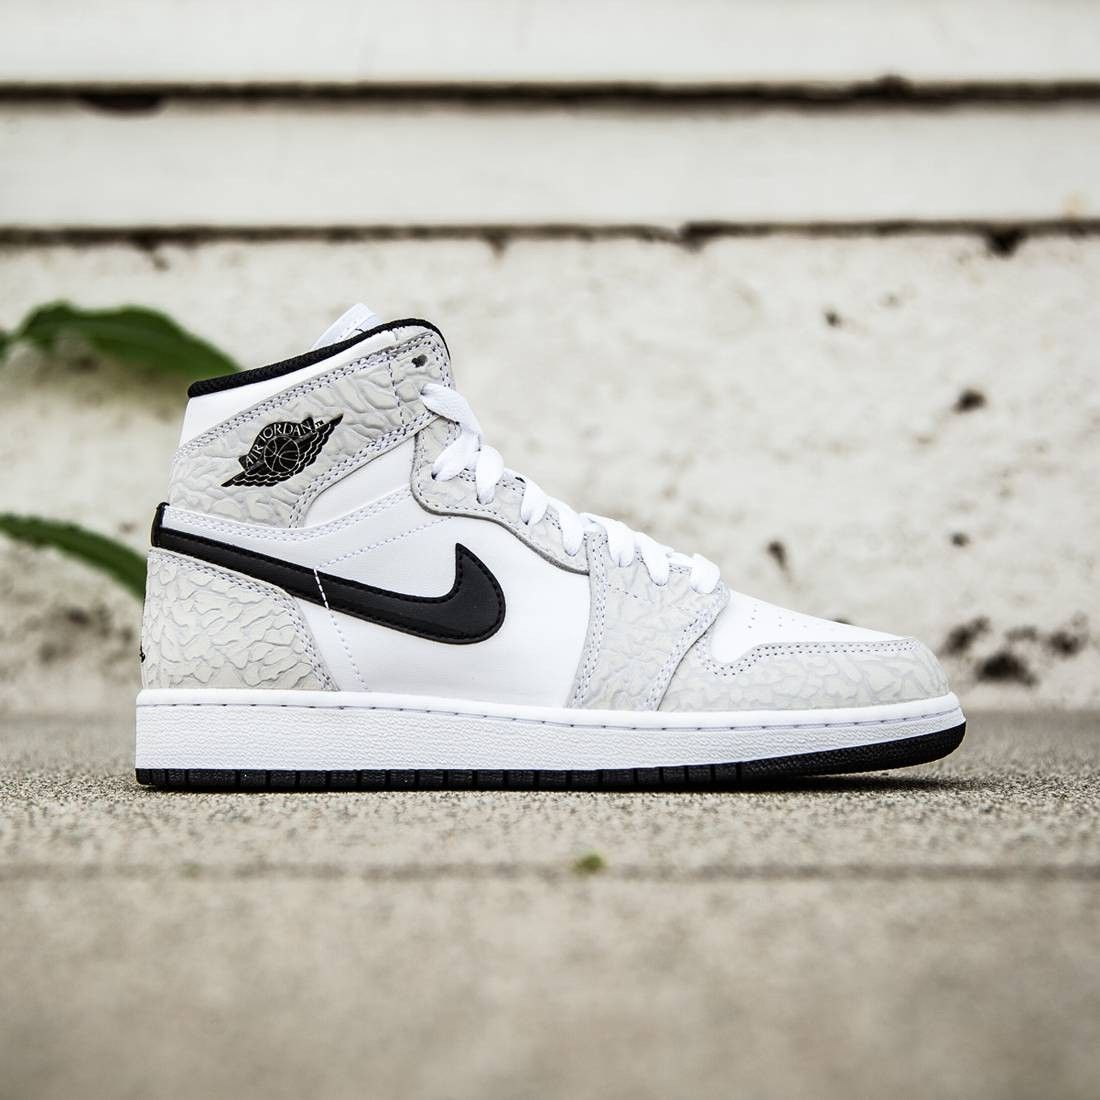 Air Jordan 1 Retro HI Prem BG Big Kids